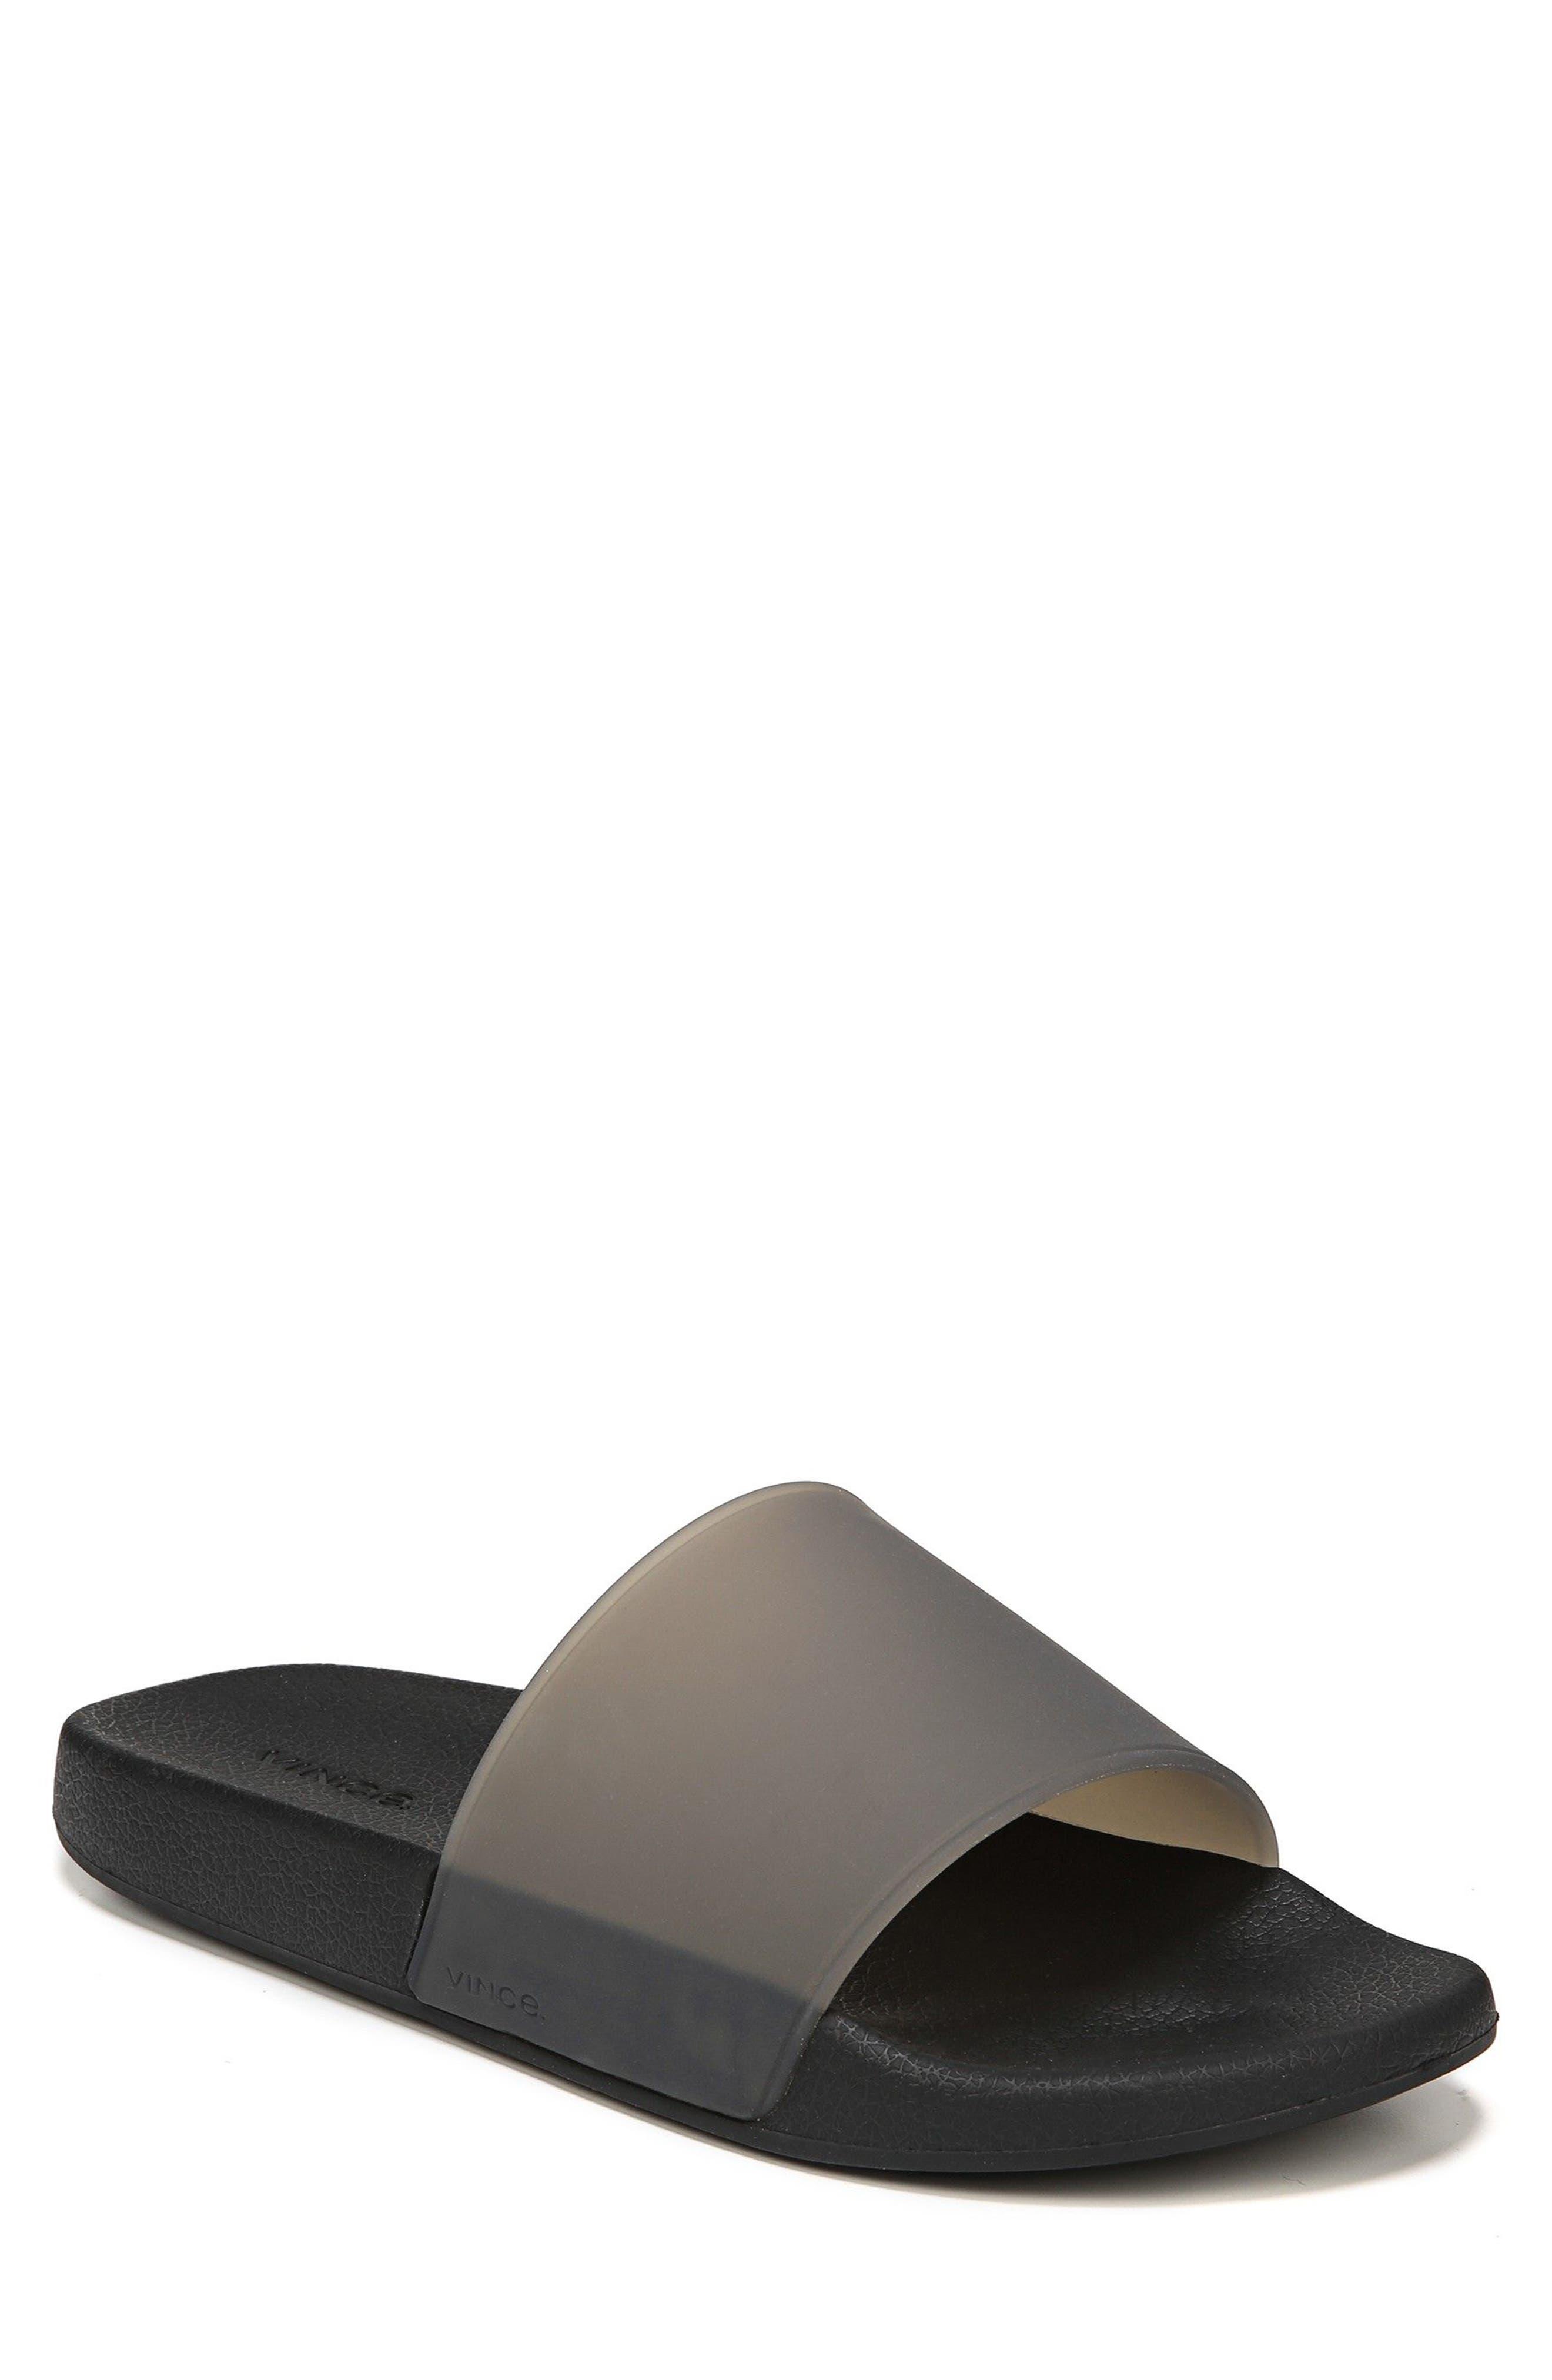 Vince Men's Westcoast Sport Sandal m1kIU3tF